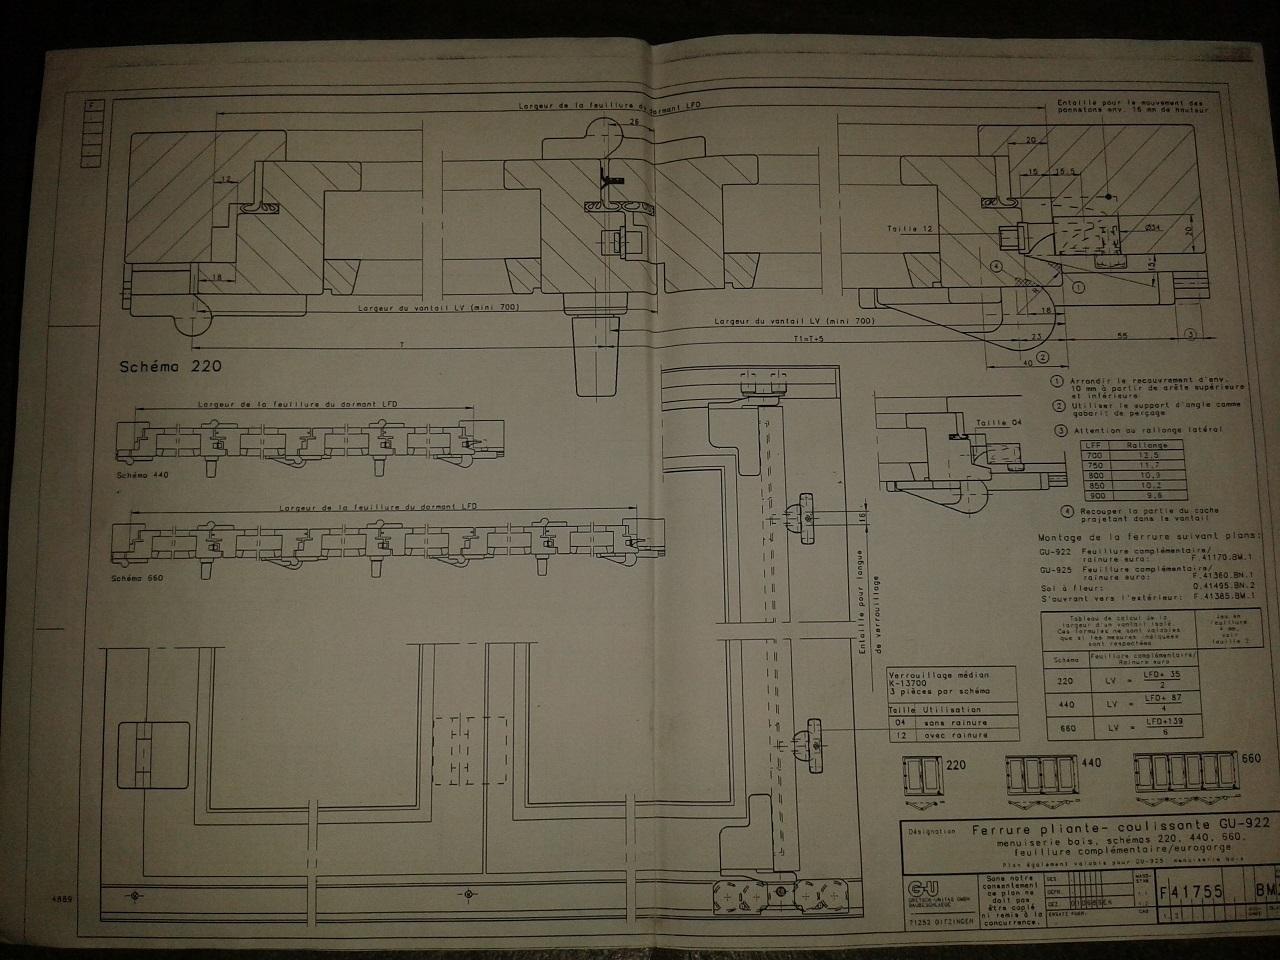 Fenêtres coulissantes - Page 2 Xioj4r_20140508_000049